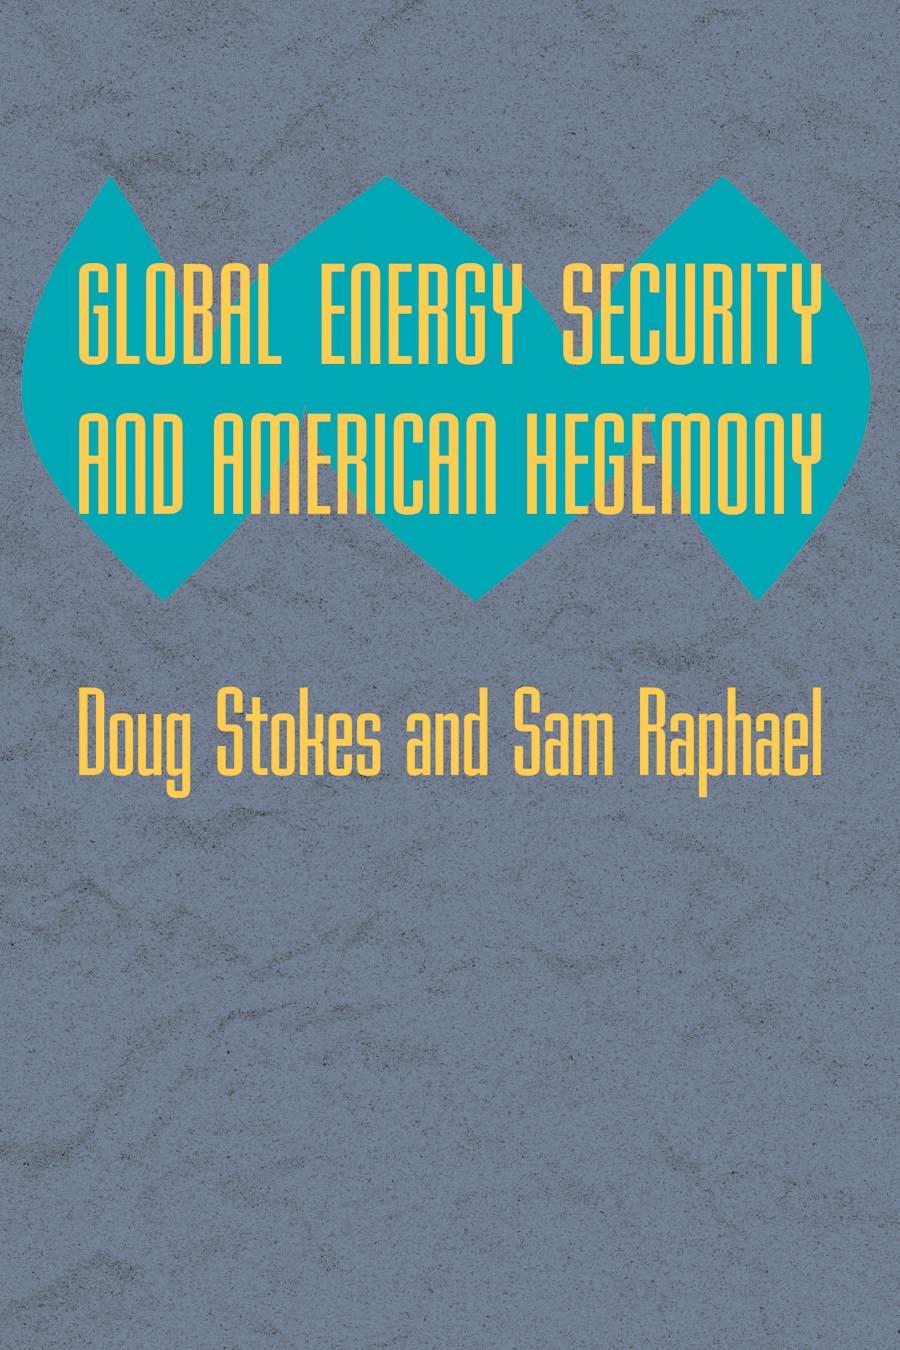 Global Energy Security and American Hegemony contesting hegemony